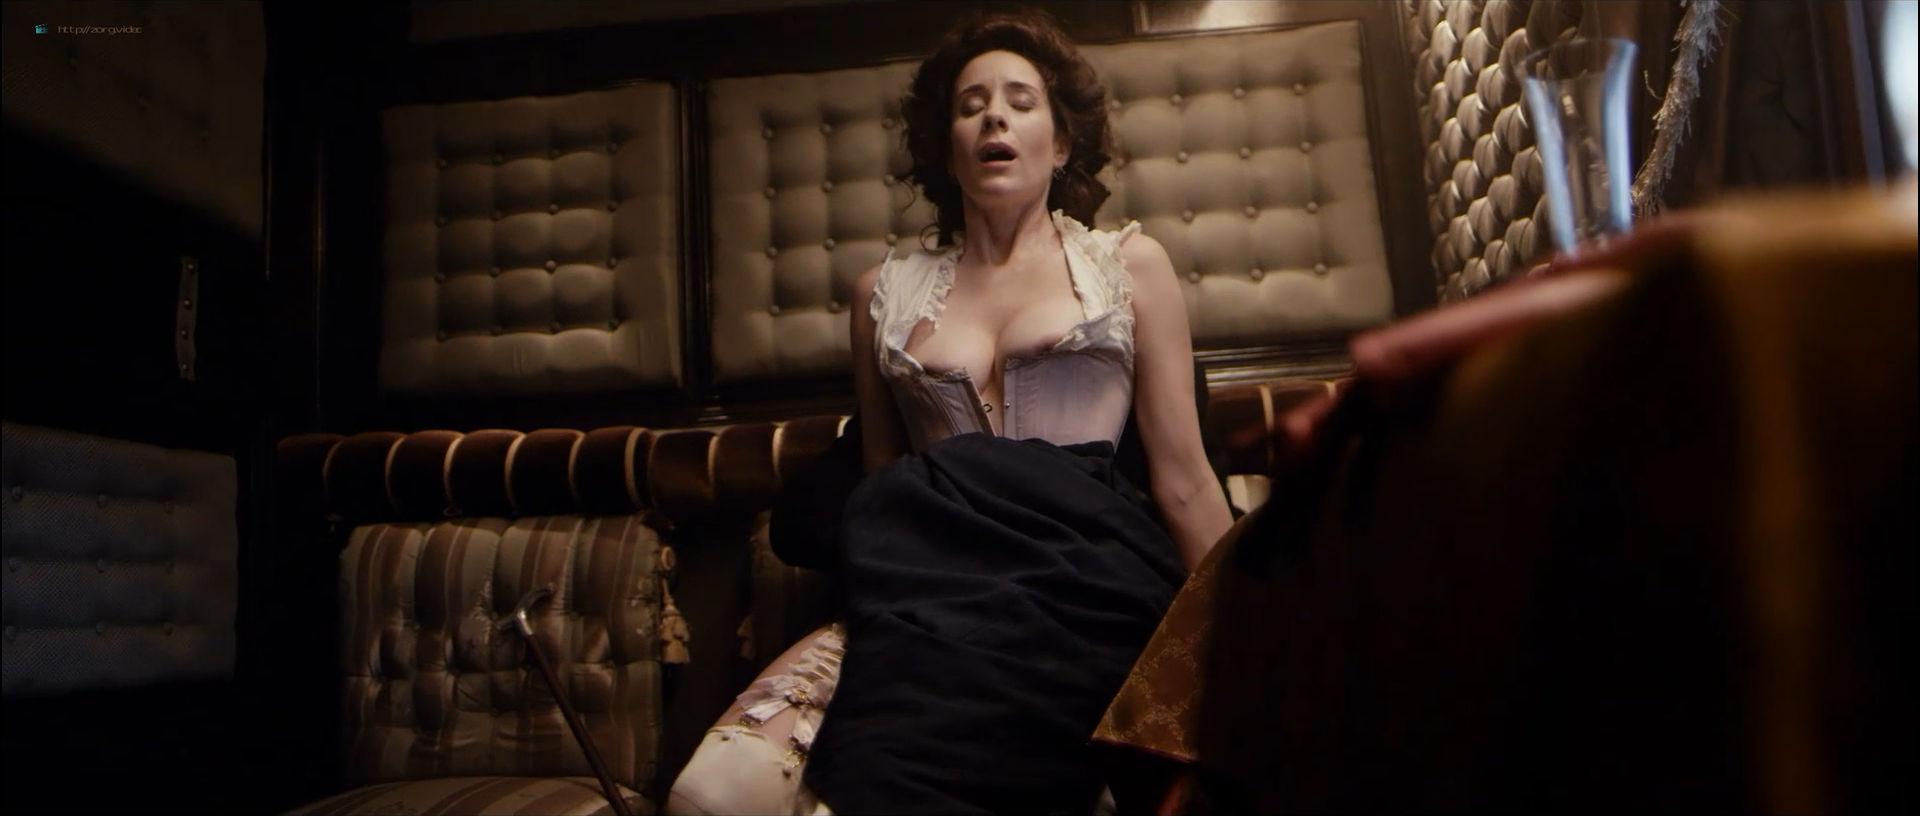 Anastasiya Meskova nude full frontal Olga Sutulova nude sex - Trotsky (2017) s1e1-2 HD 1080p (5)